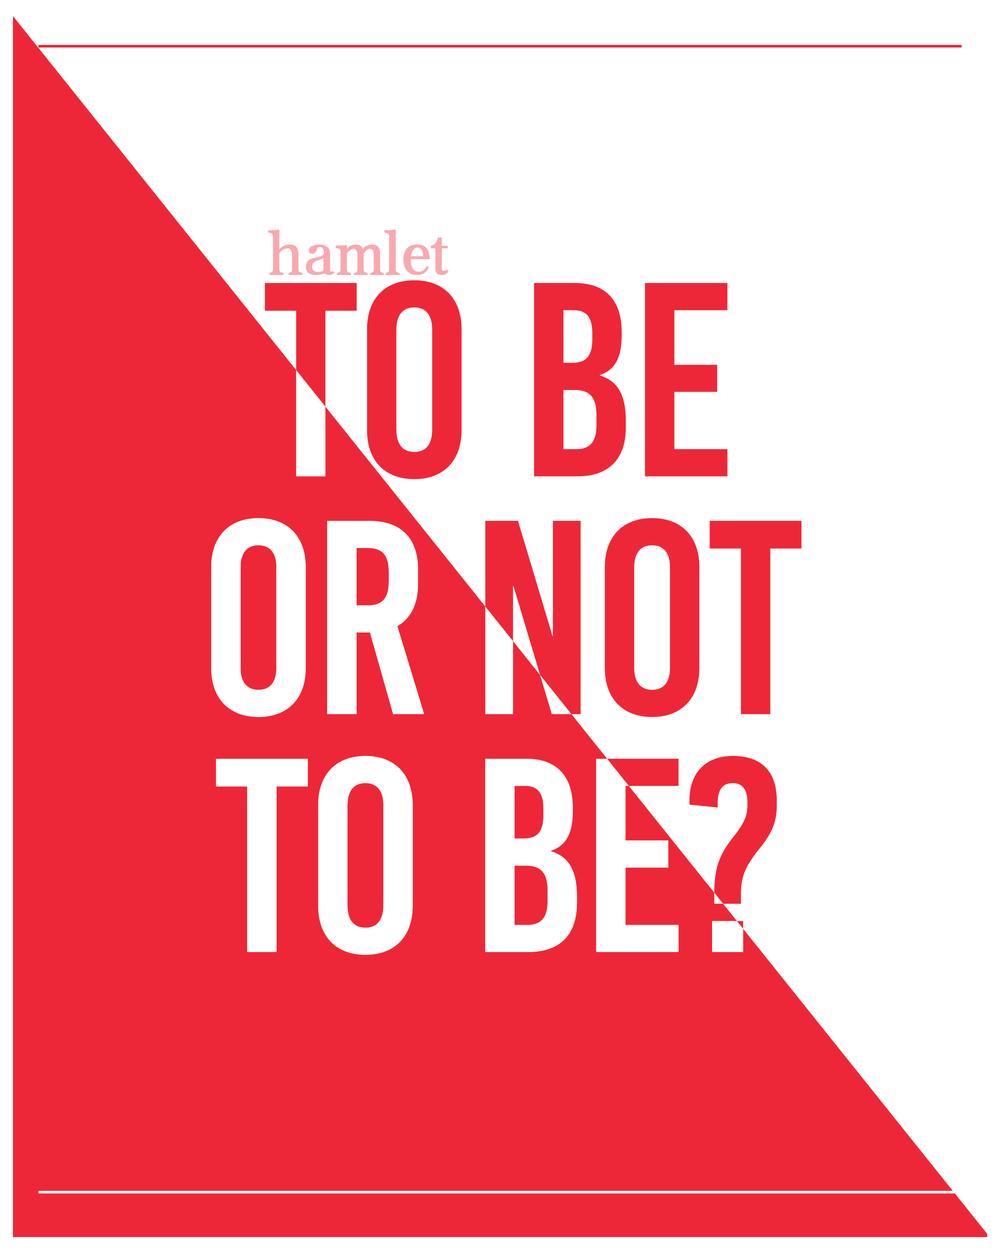 Hamlet Posters ACT III-02.png